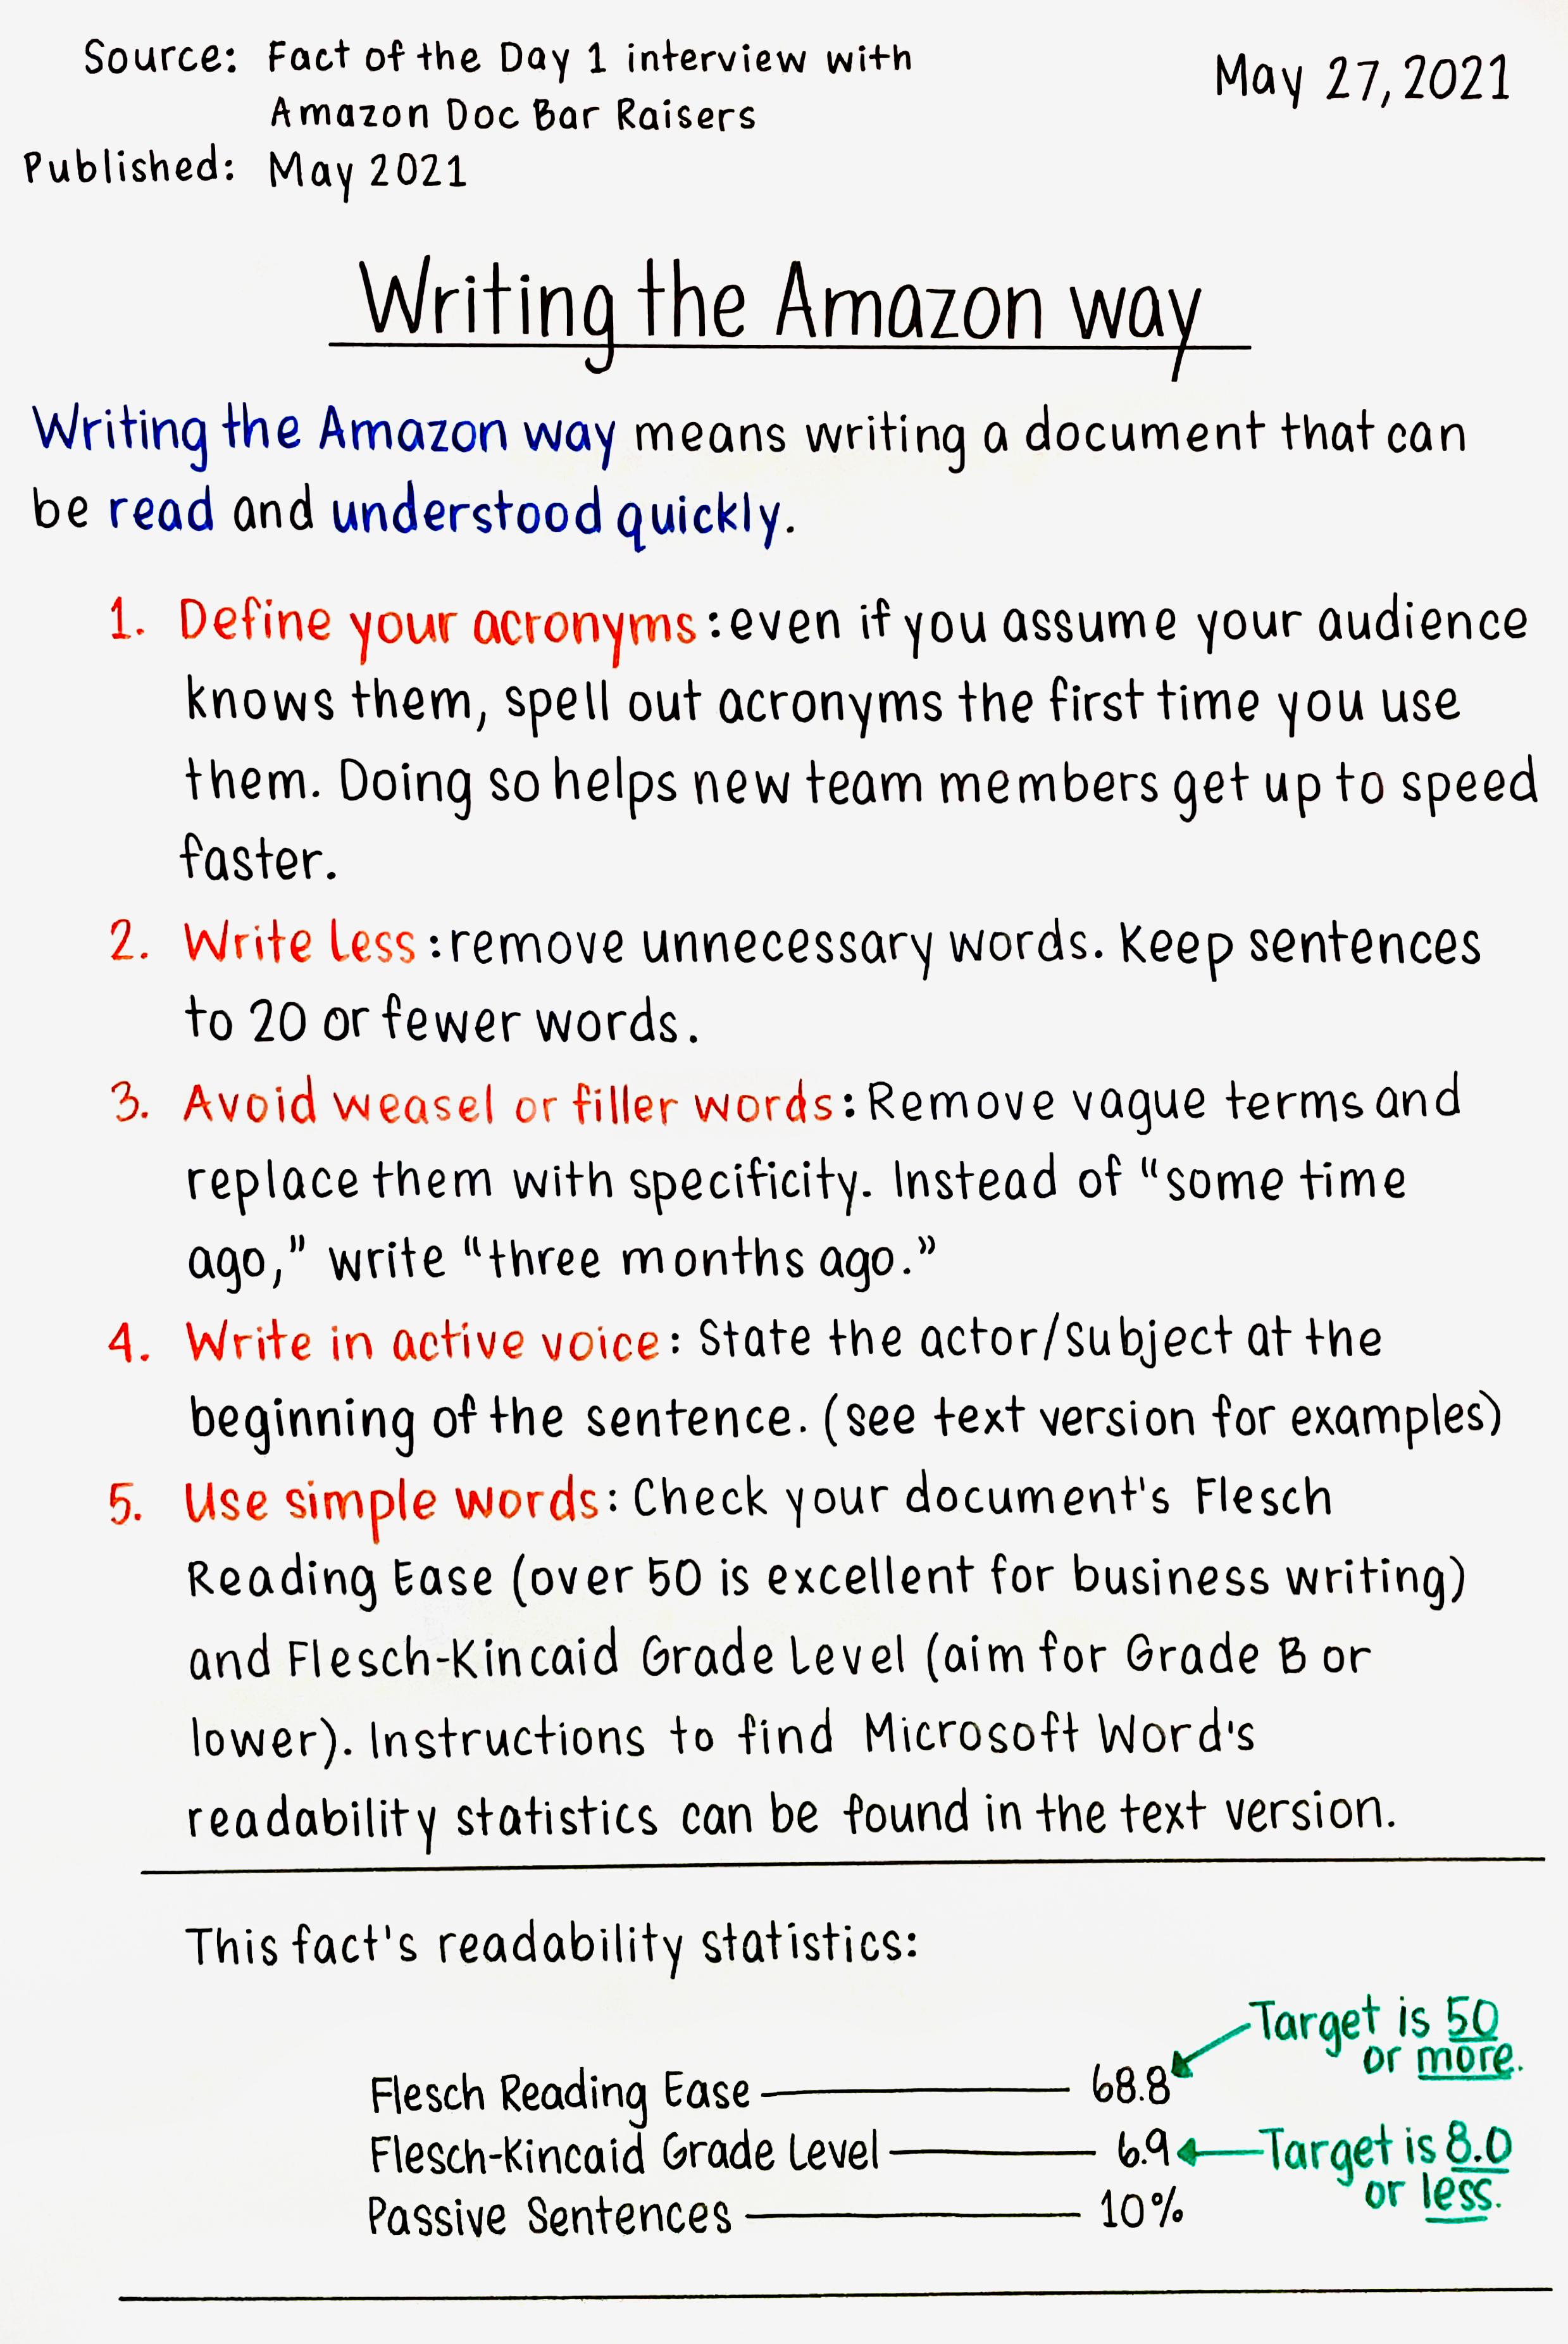 Writing the Amazon way